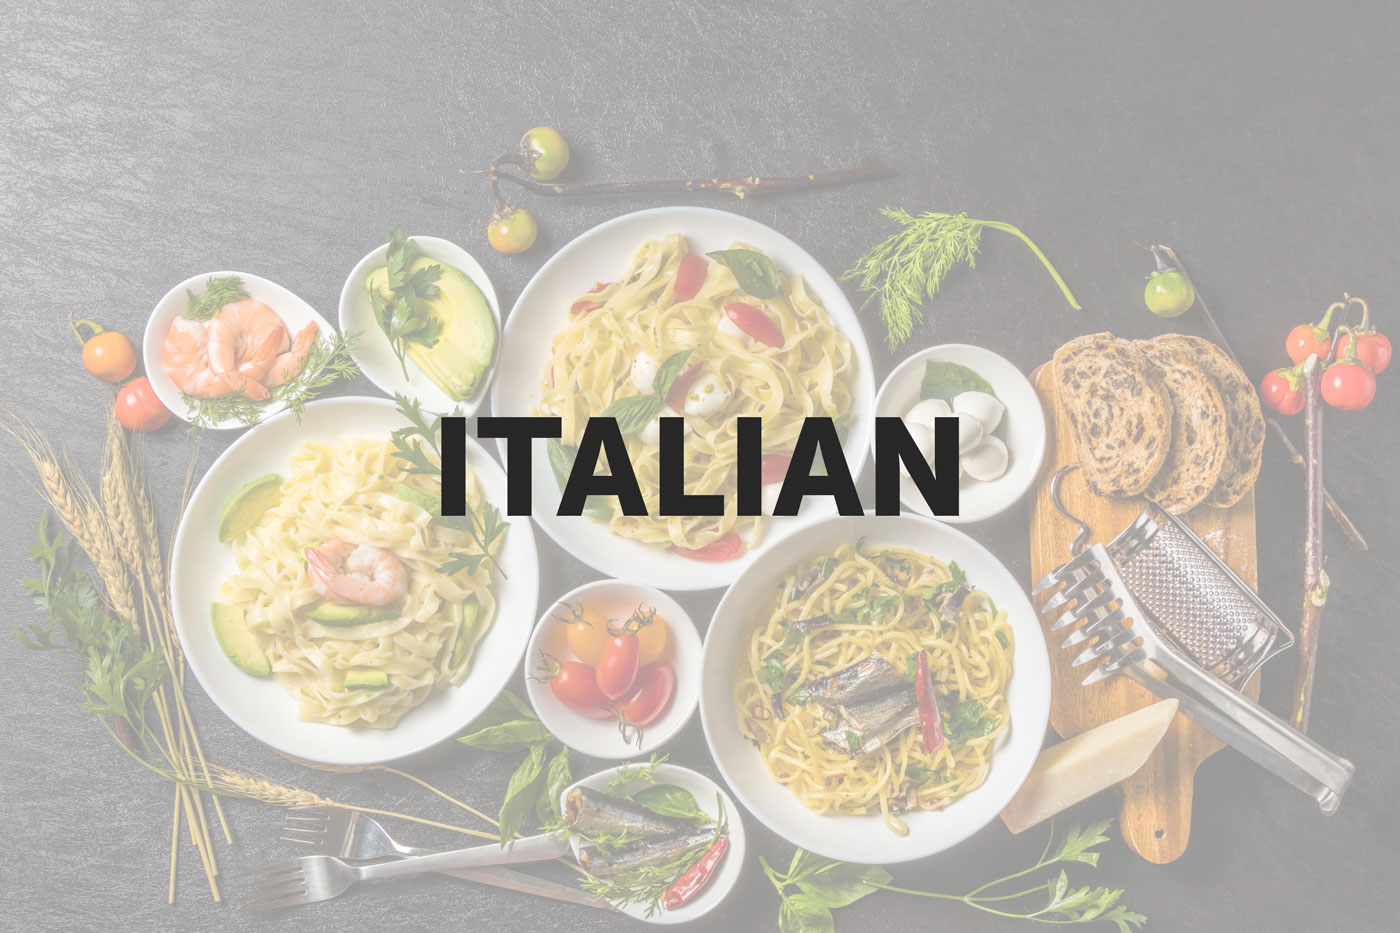 Italian--Buffet-at-Great-British-Restaurant